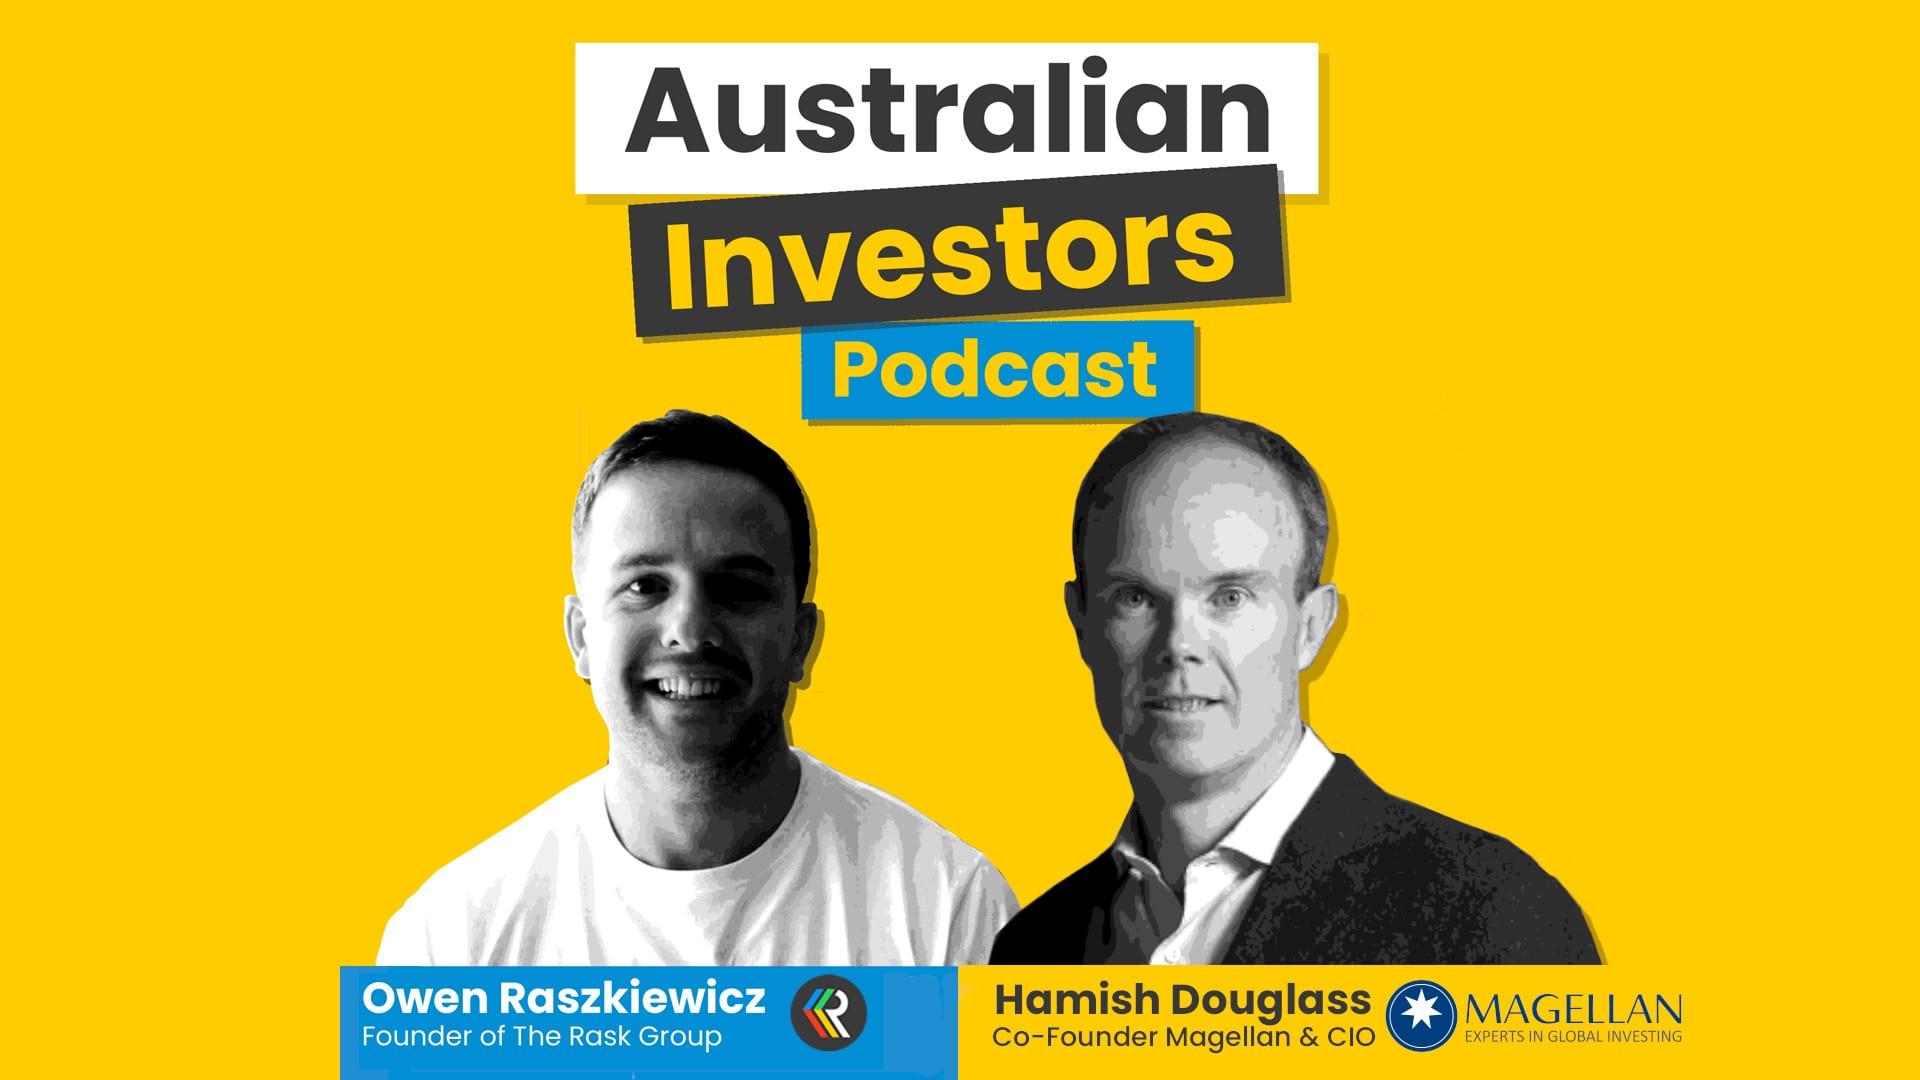 hamish douglass australian investors podcast